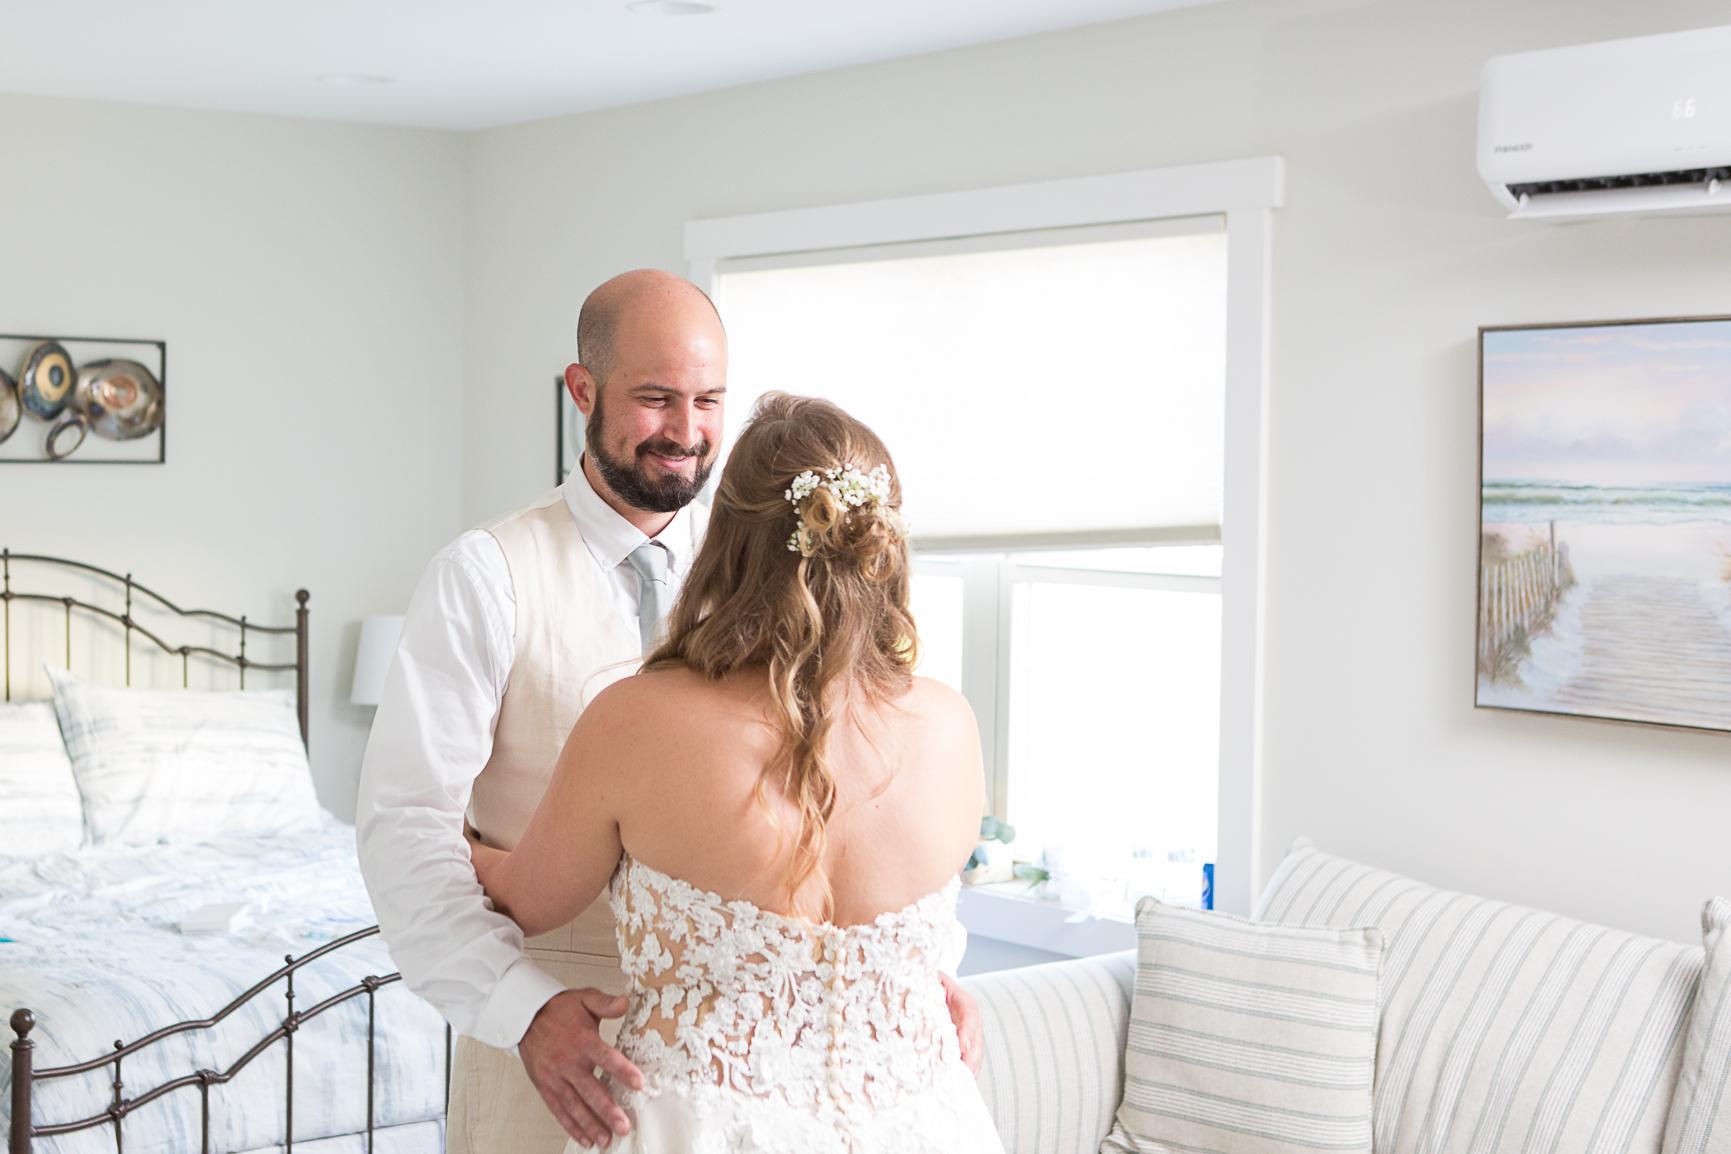 Raleigh wedding photographer - 101 studio llc -6.jpg